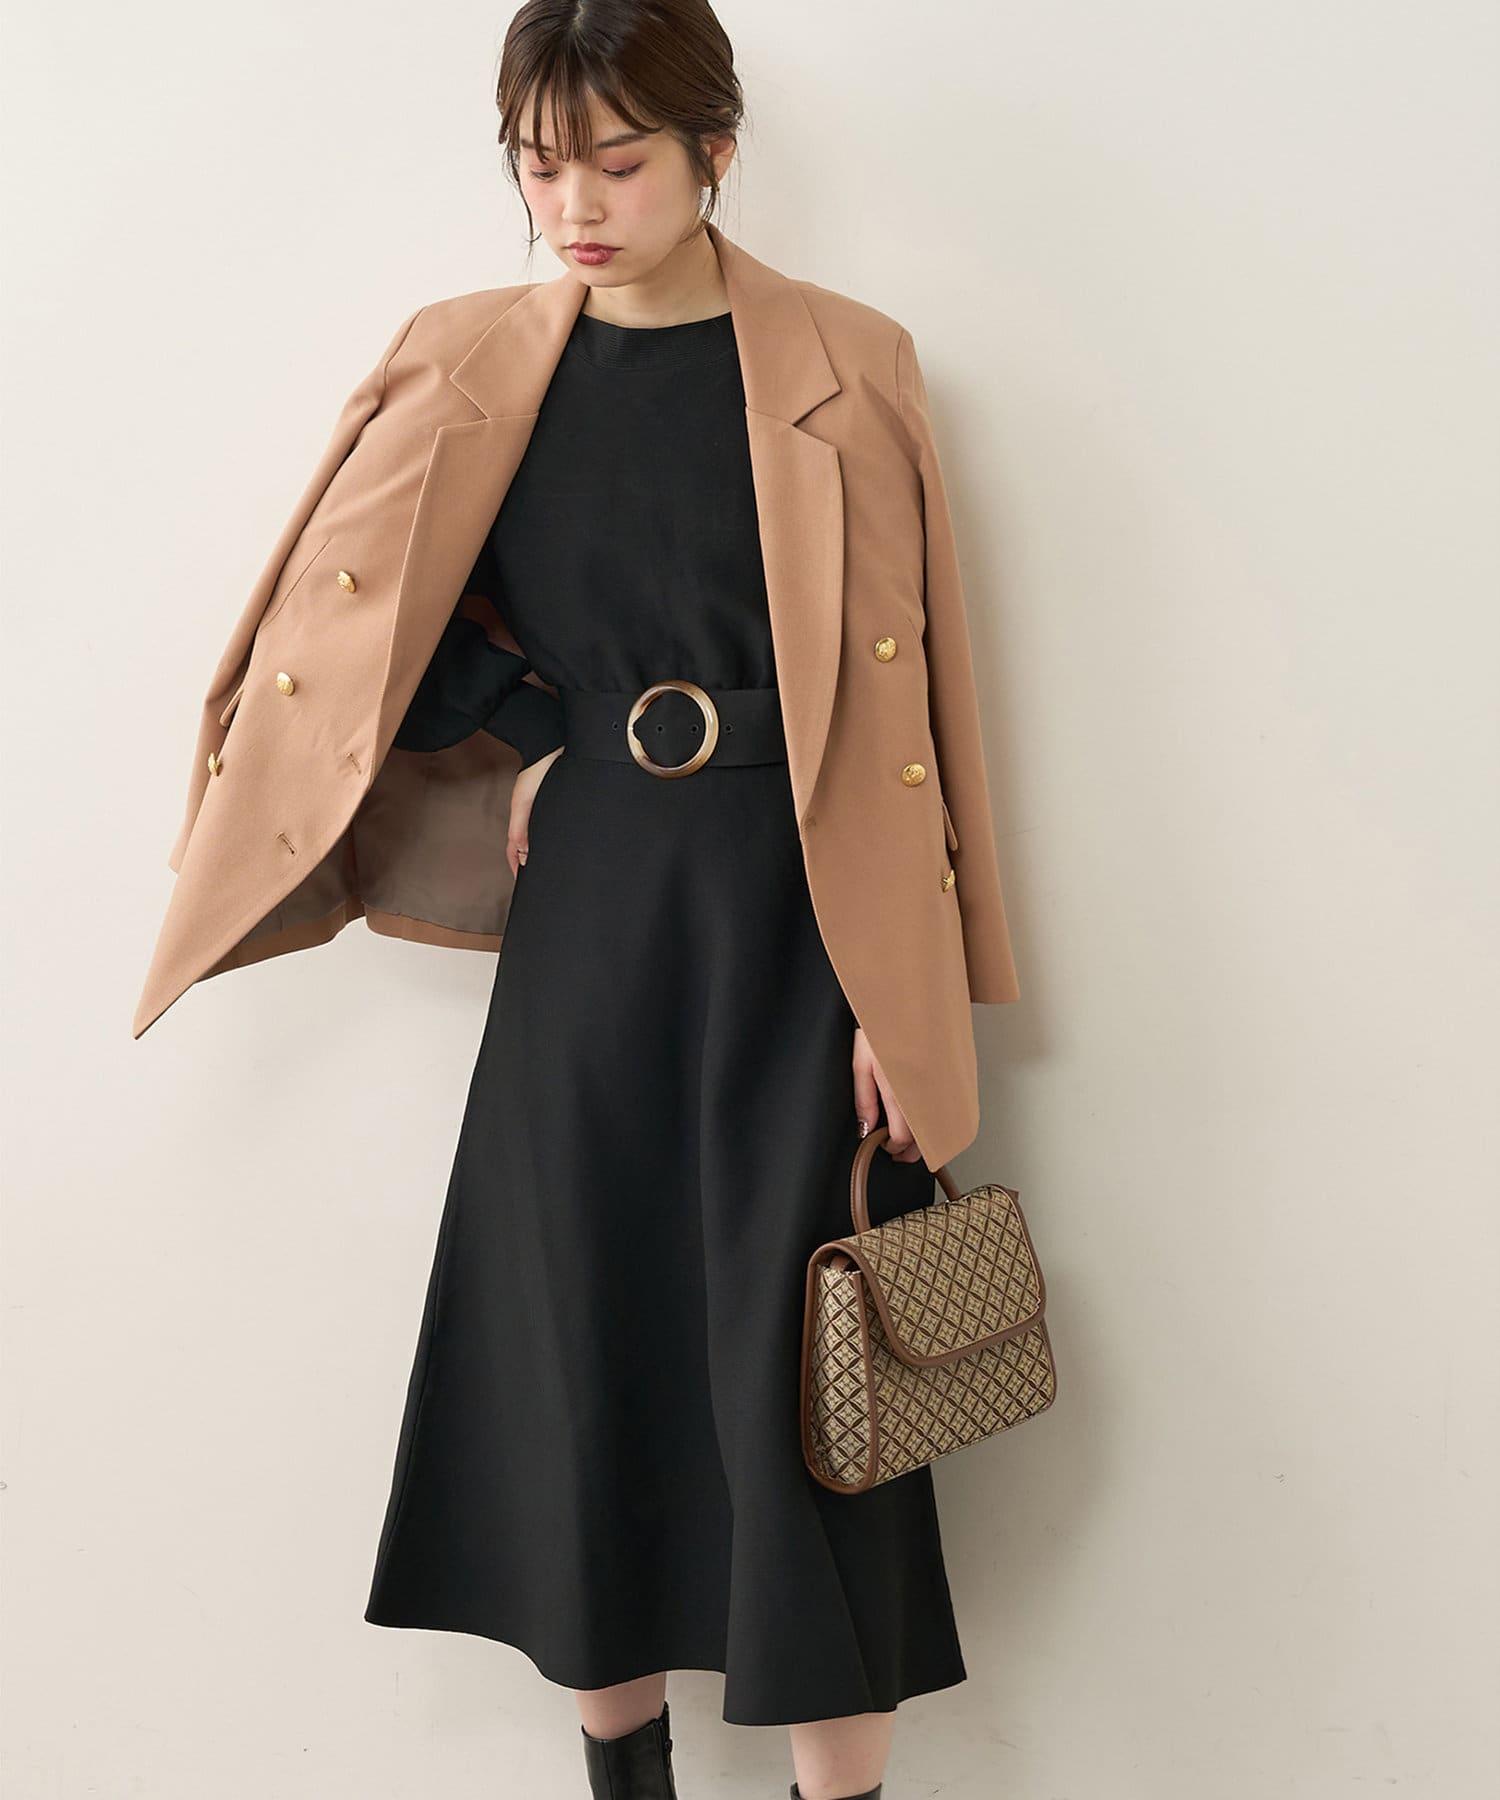 natural couture(ナチュラルクチュール) フワ軽2WAY Aラインワンピース